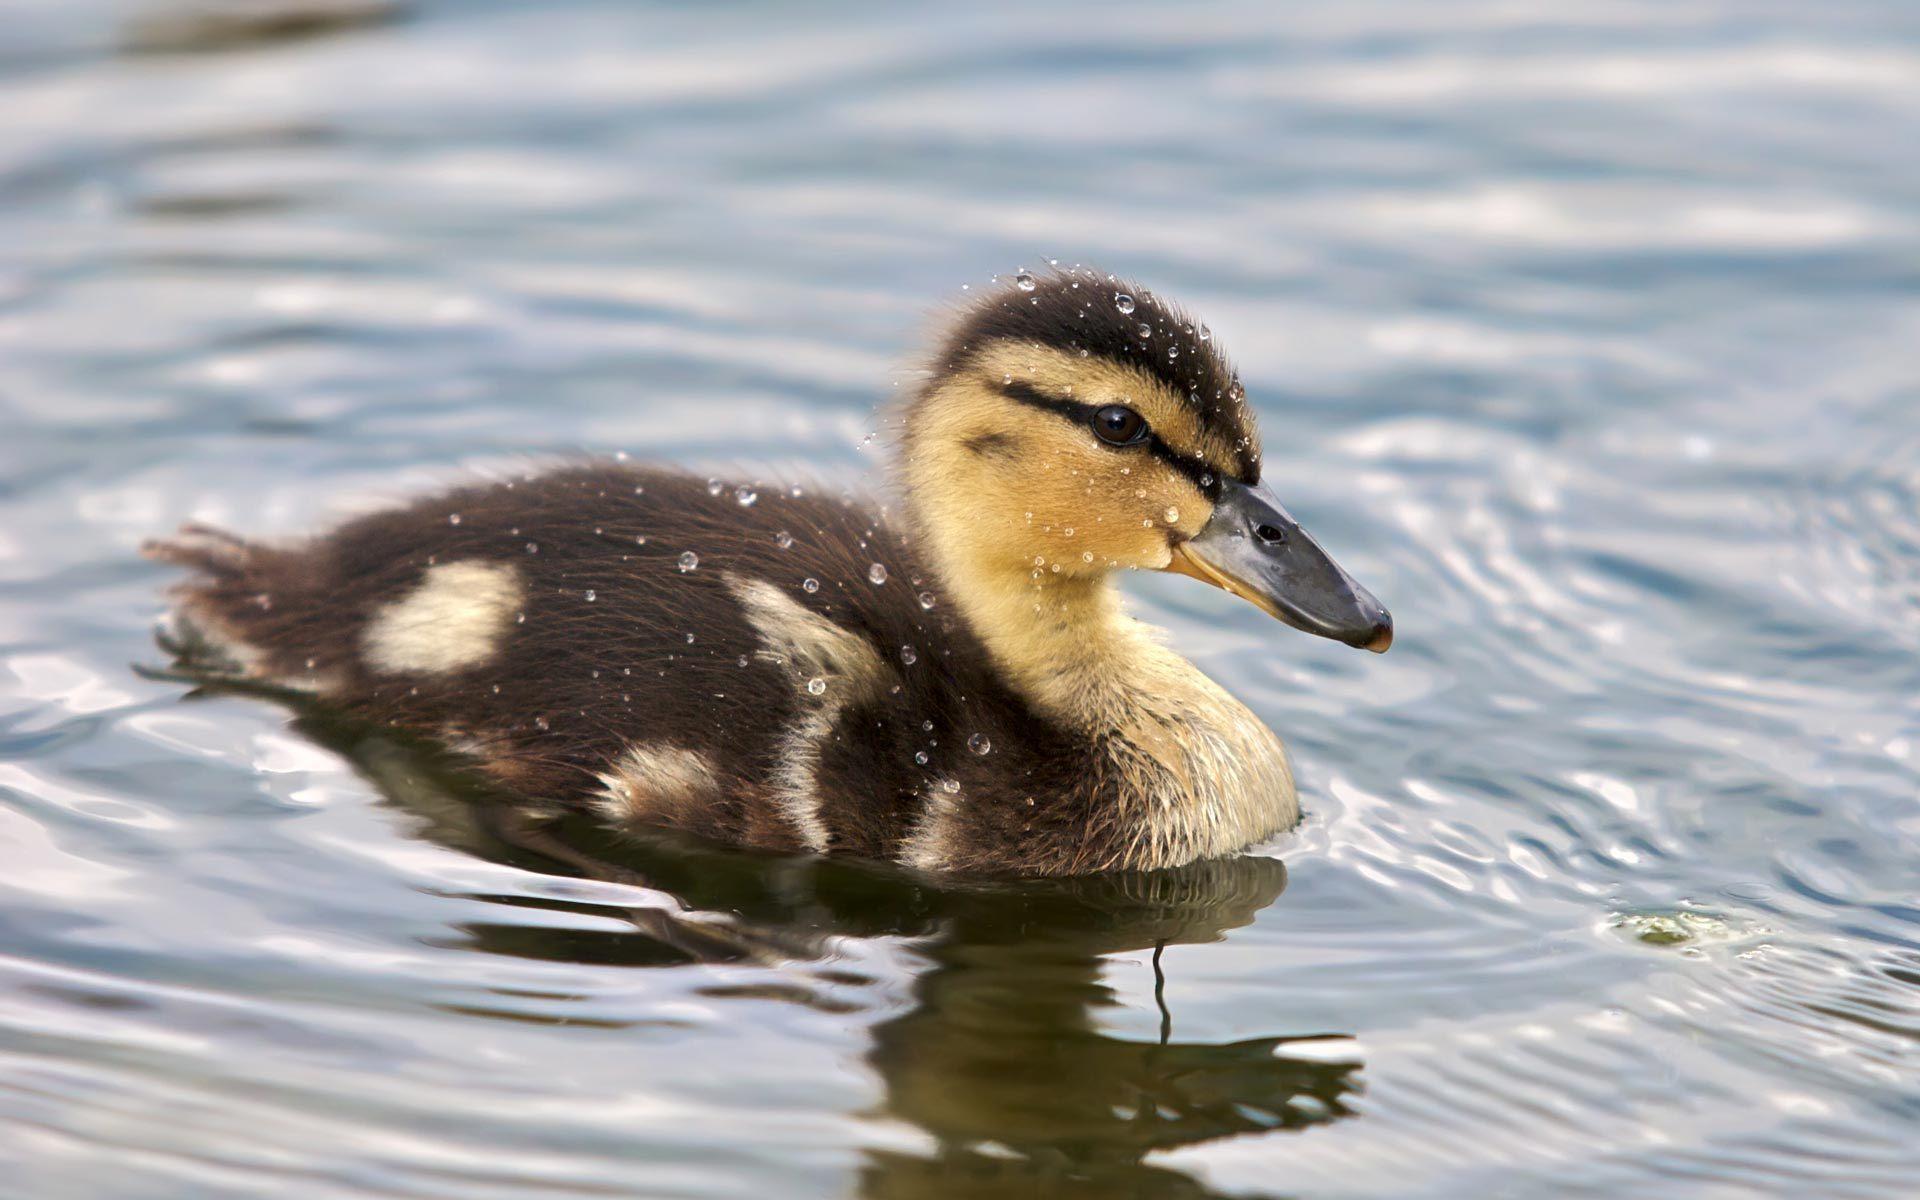 Duckling fluffy feather drop water drops duck wallpaper ...